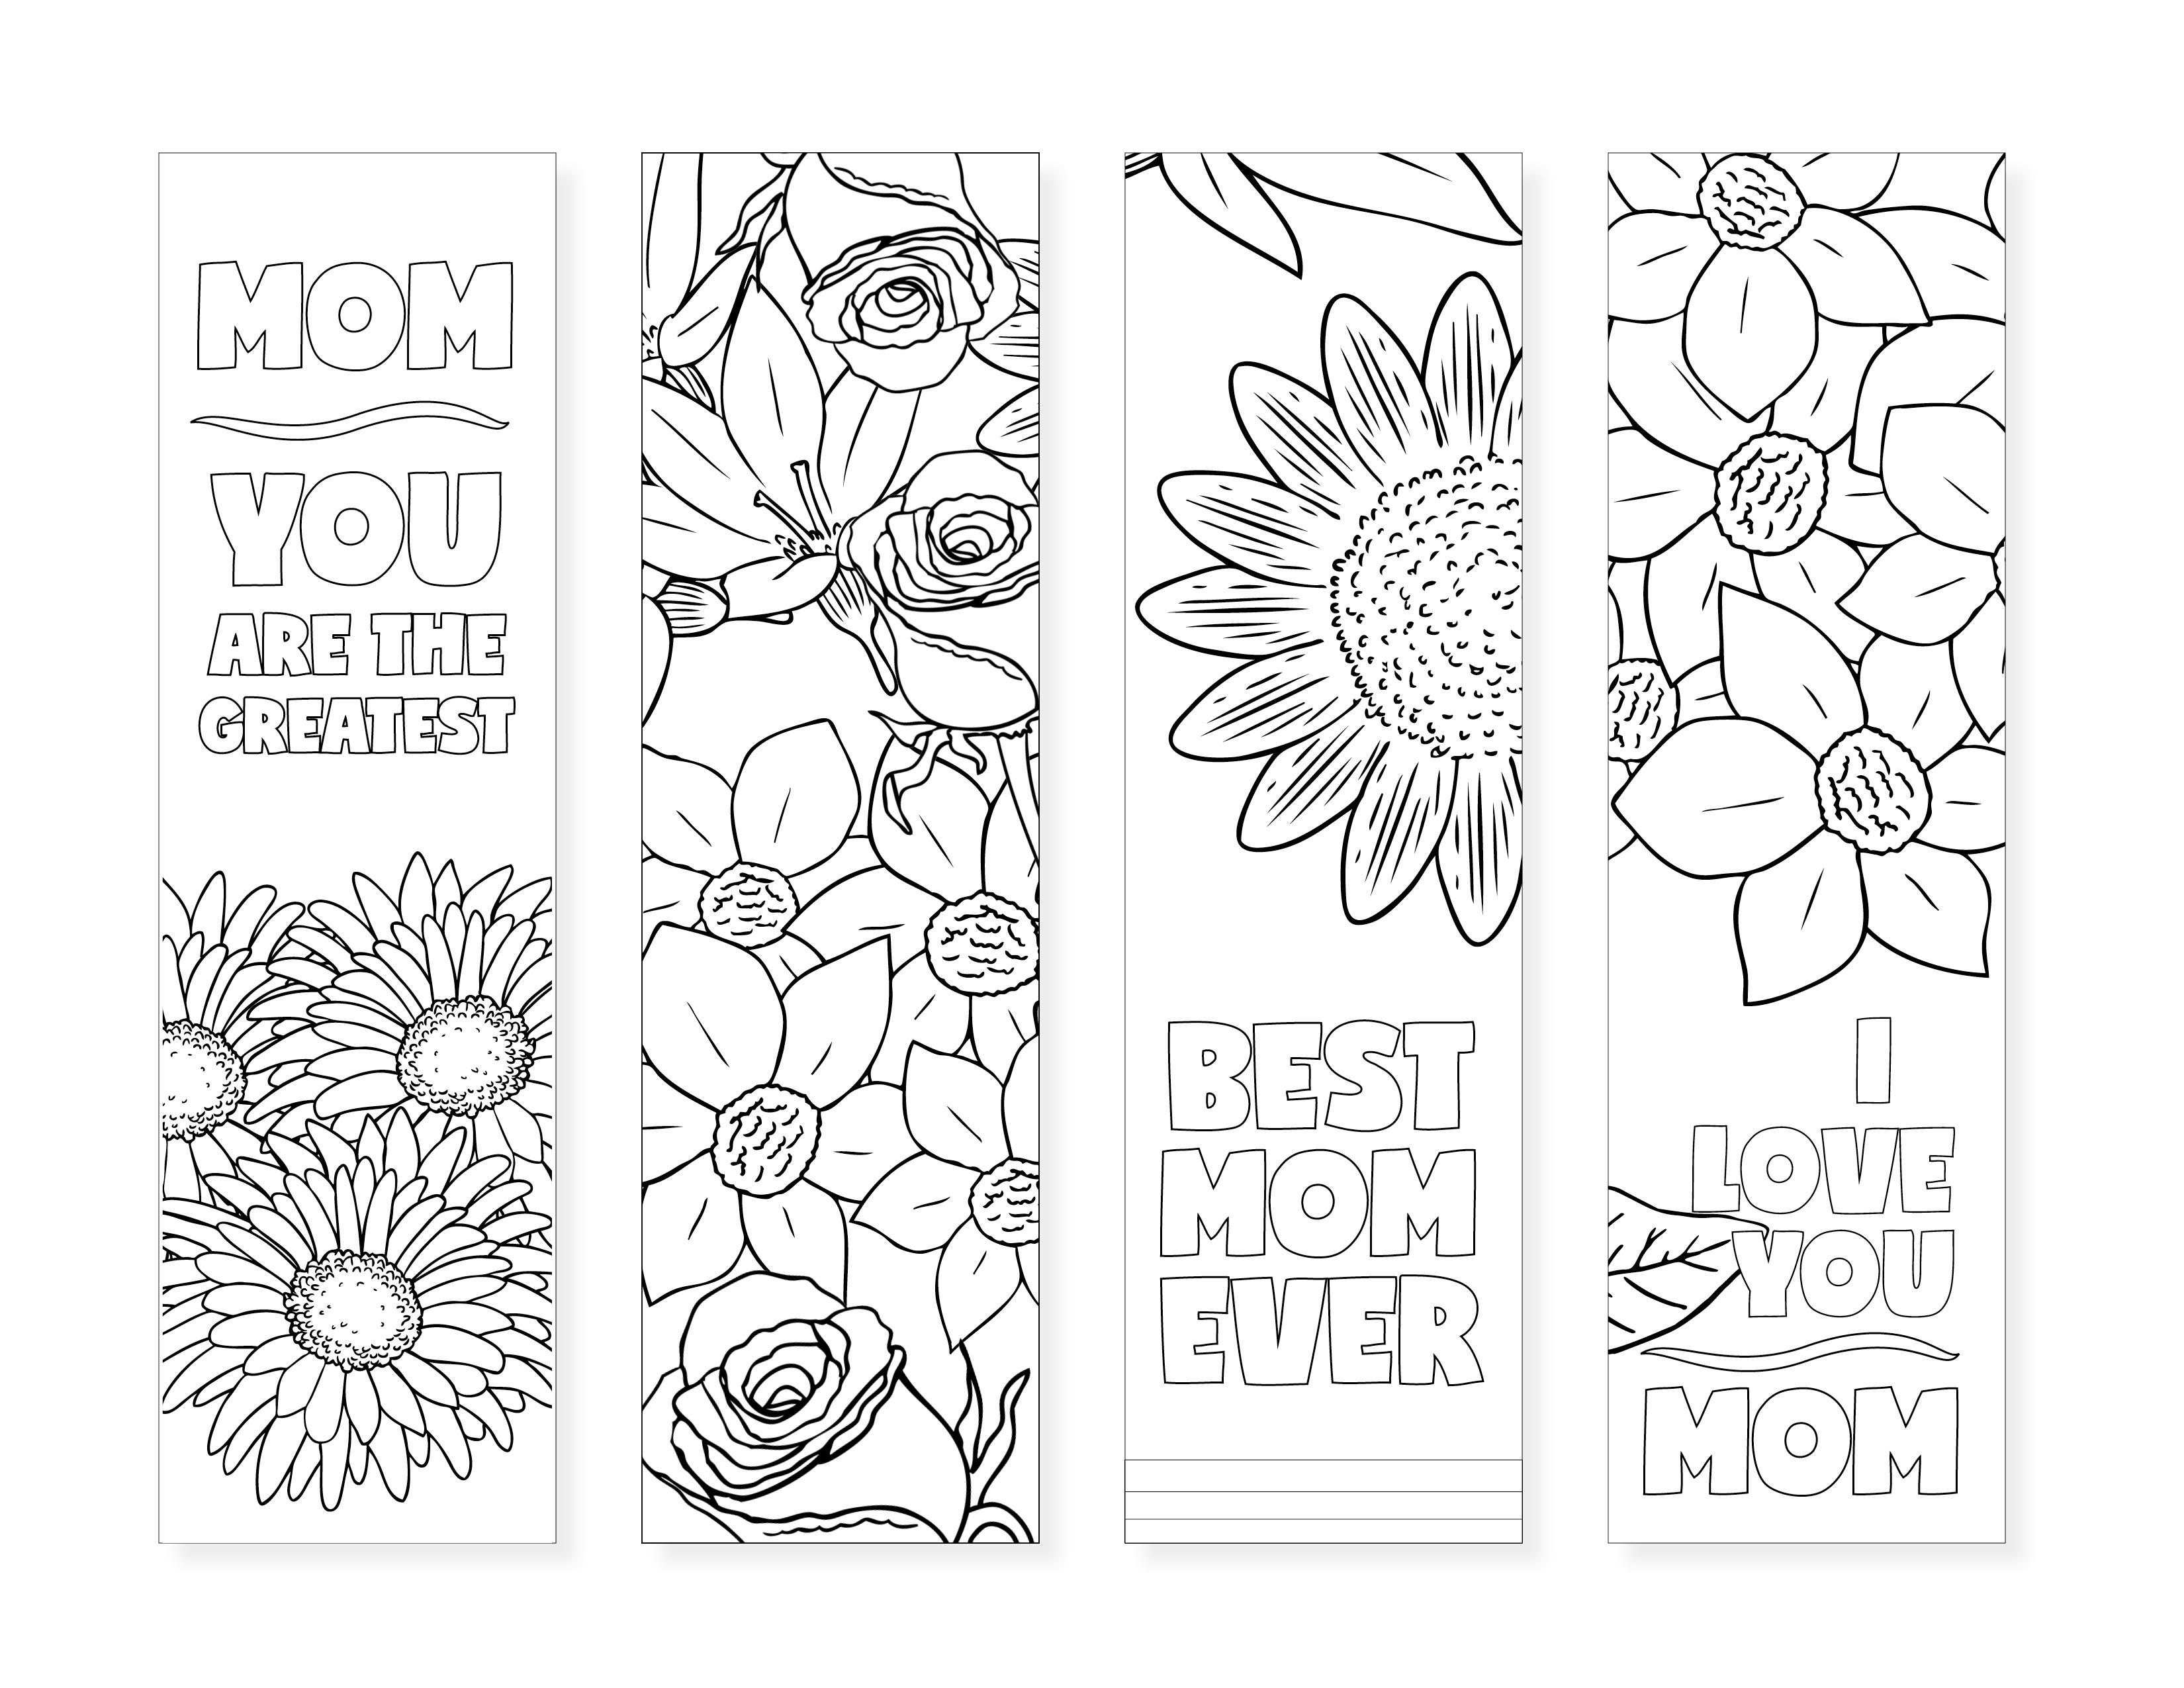 Free Printable Bookmarks For Moms - Design Dazzle - Free Printable Bookmarks